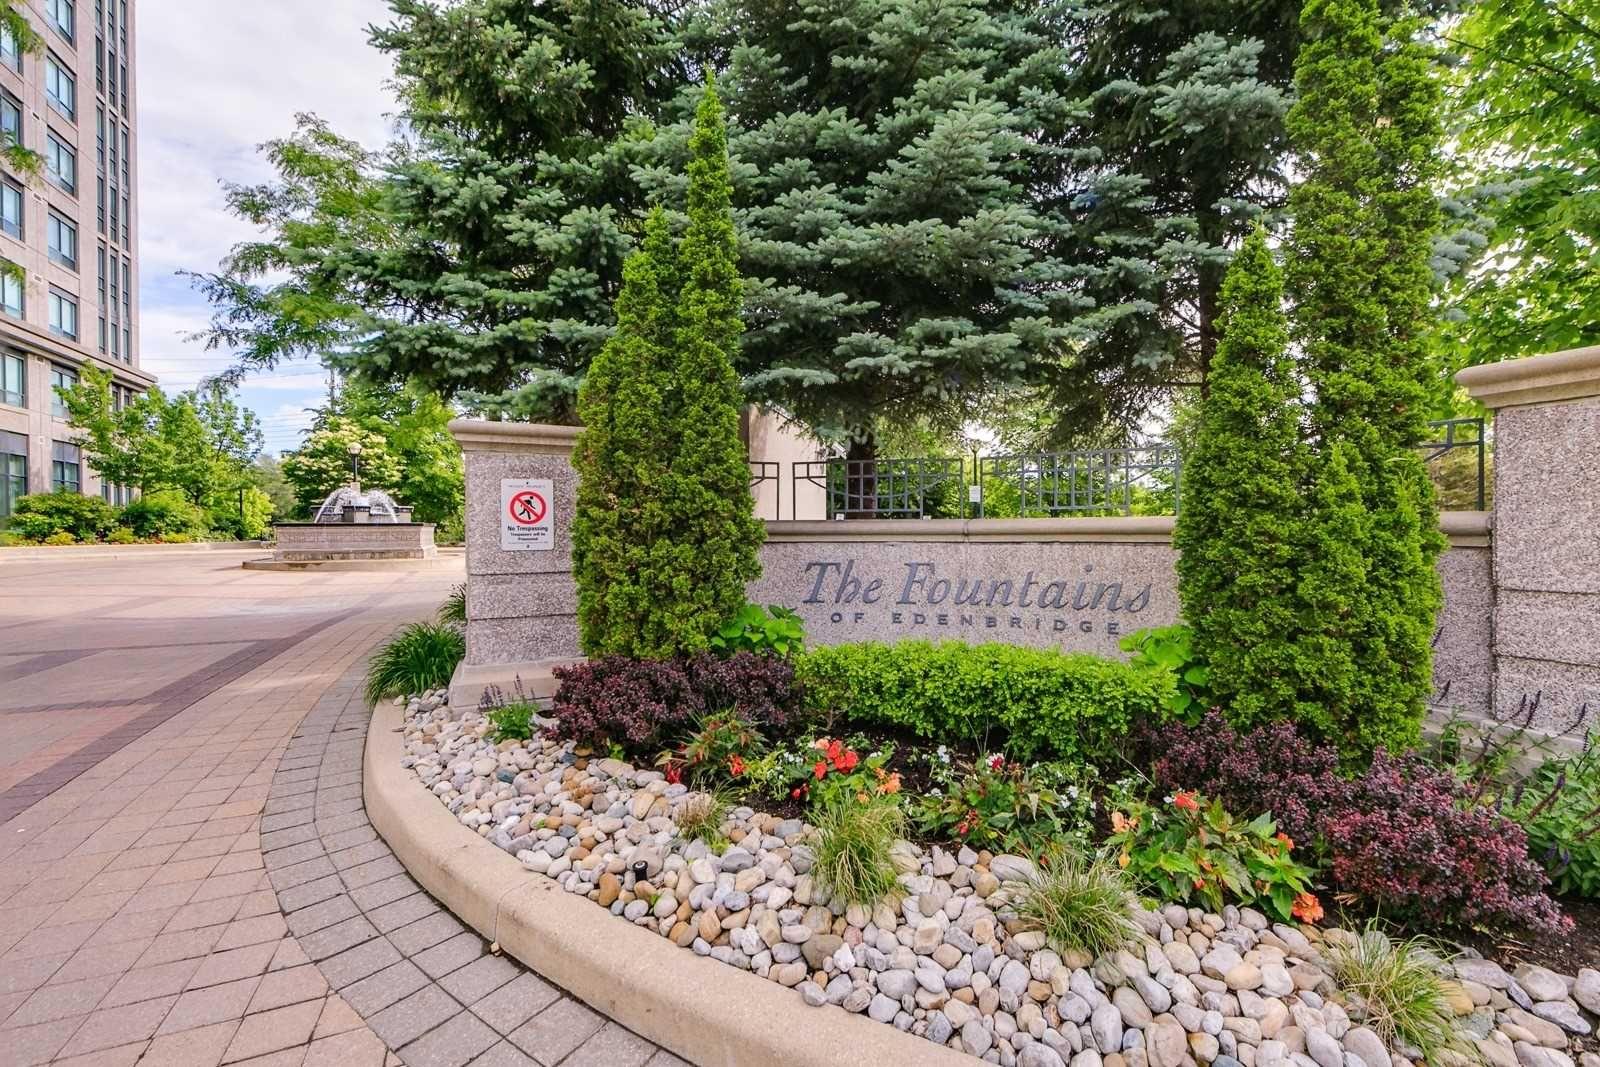 Main Photo: 1409 38 Fontenay Court in Toronto: Edenbridge-Humber Valley Condo for sale (Toronto W08)  : MLS®# W5272197